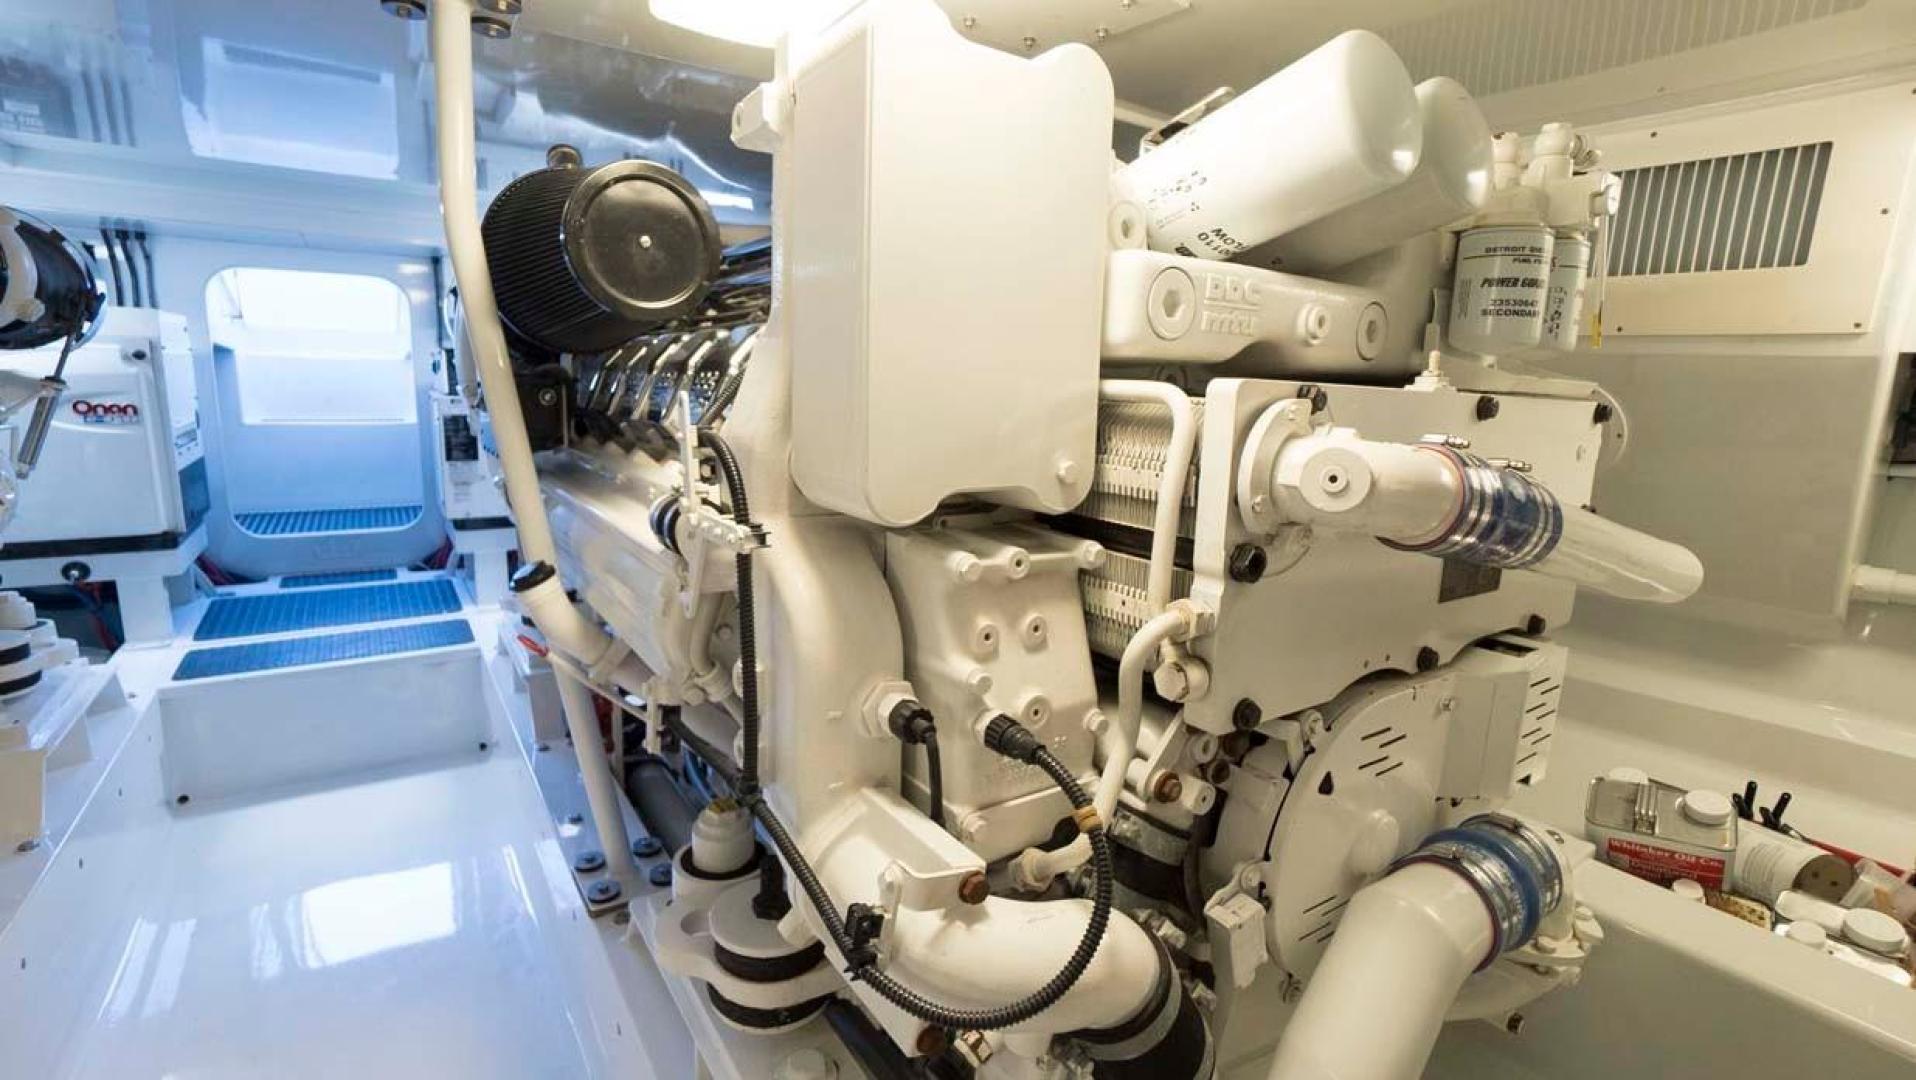 Jim-Smith-Custom-Convertible-Sportfish-2006-Silky-Palm-Beach-Florida-United-States-Port-MTU-Engine-924618